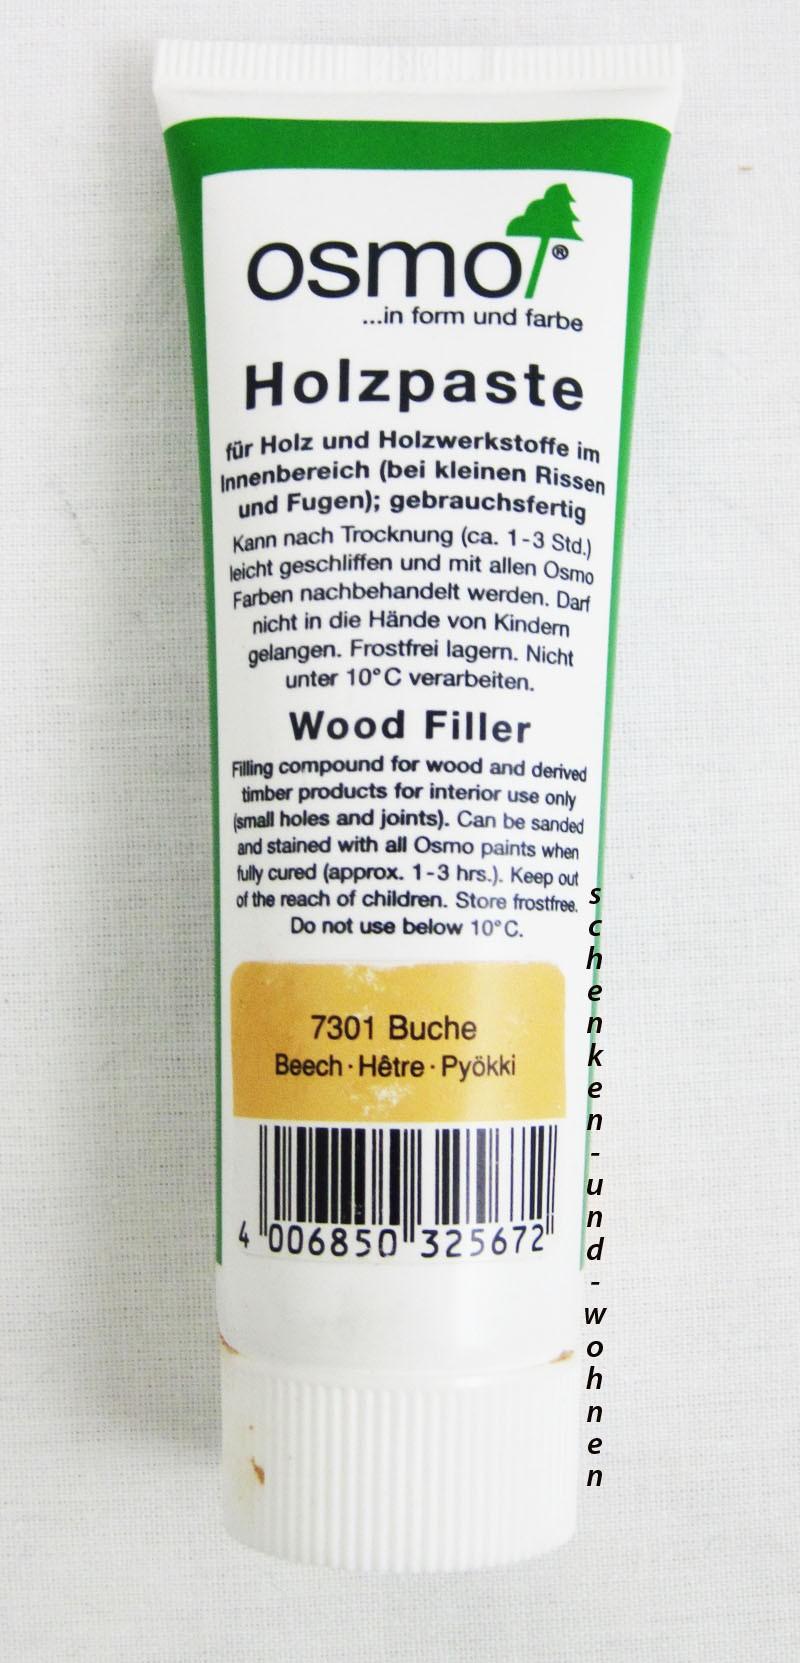 Osmo Holzpaste 7301 Buche 100 g